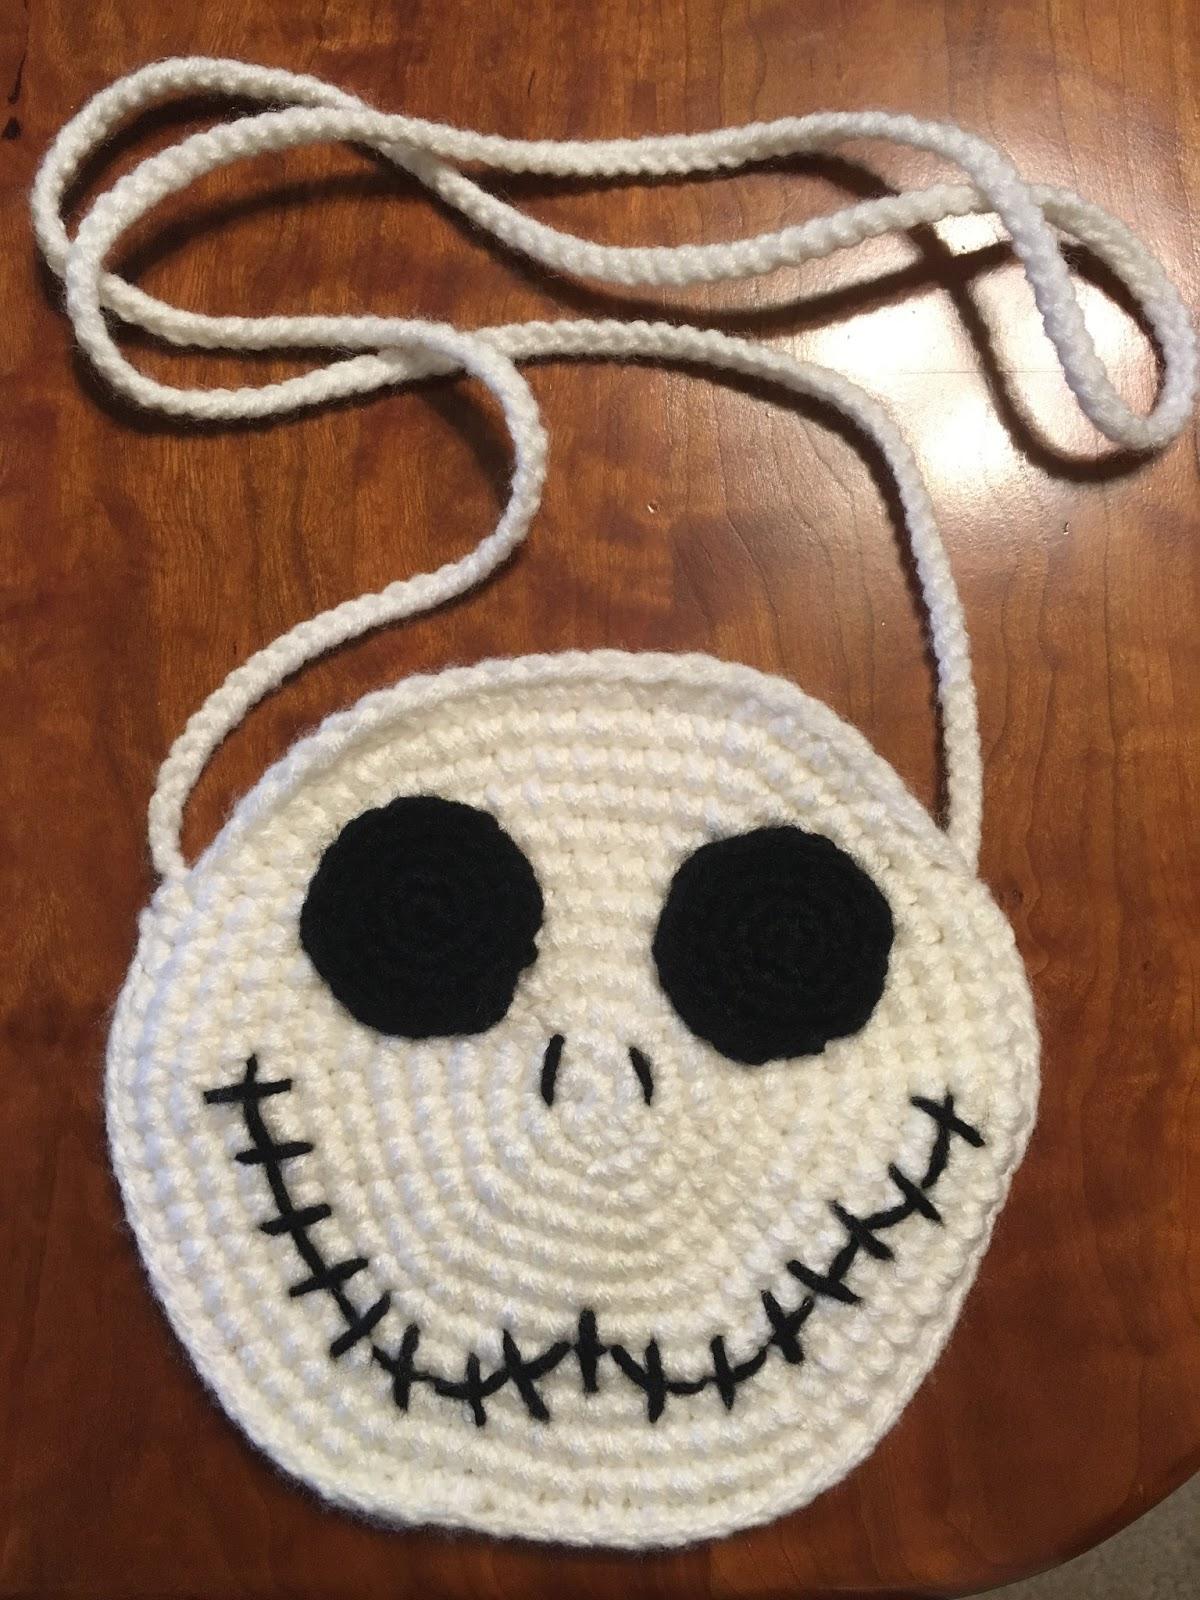 crochet jack skellington | Tumblr | 1600x1200